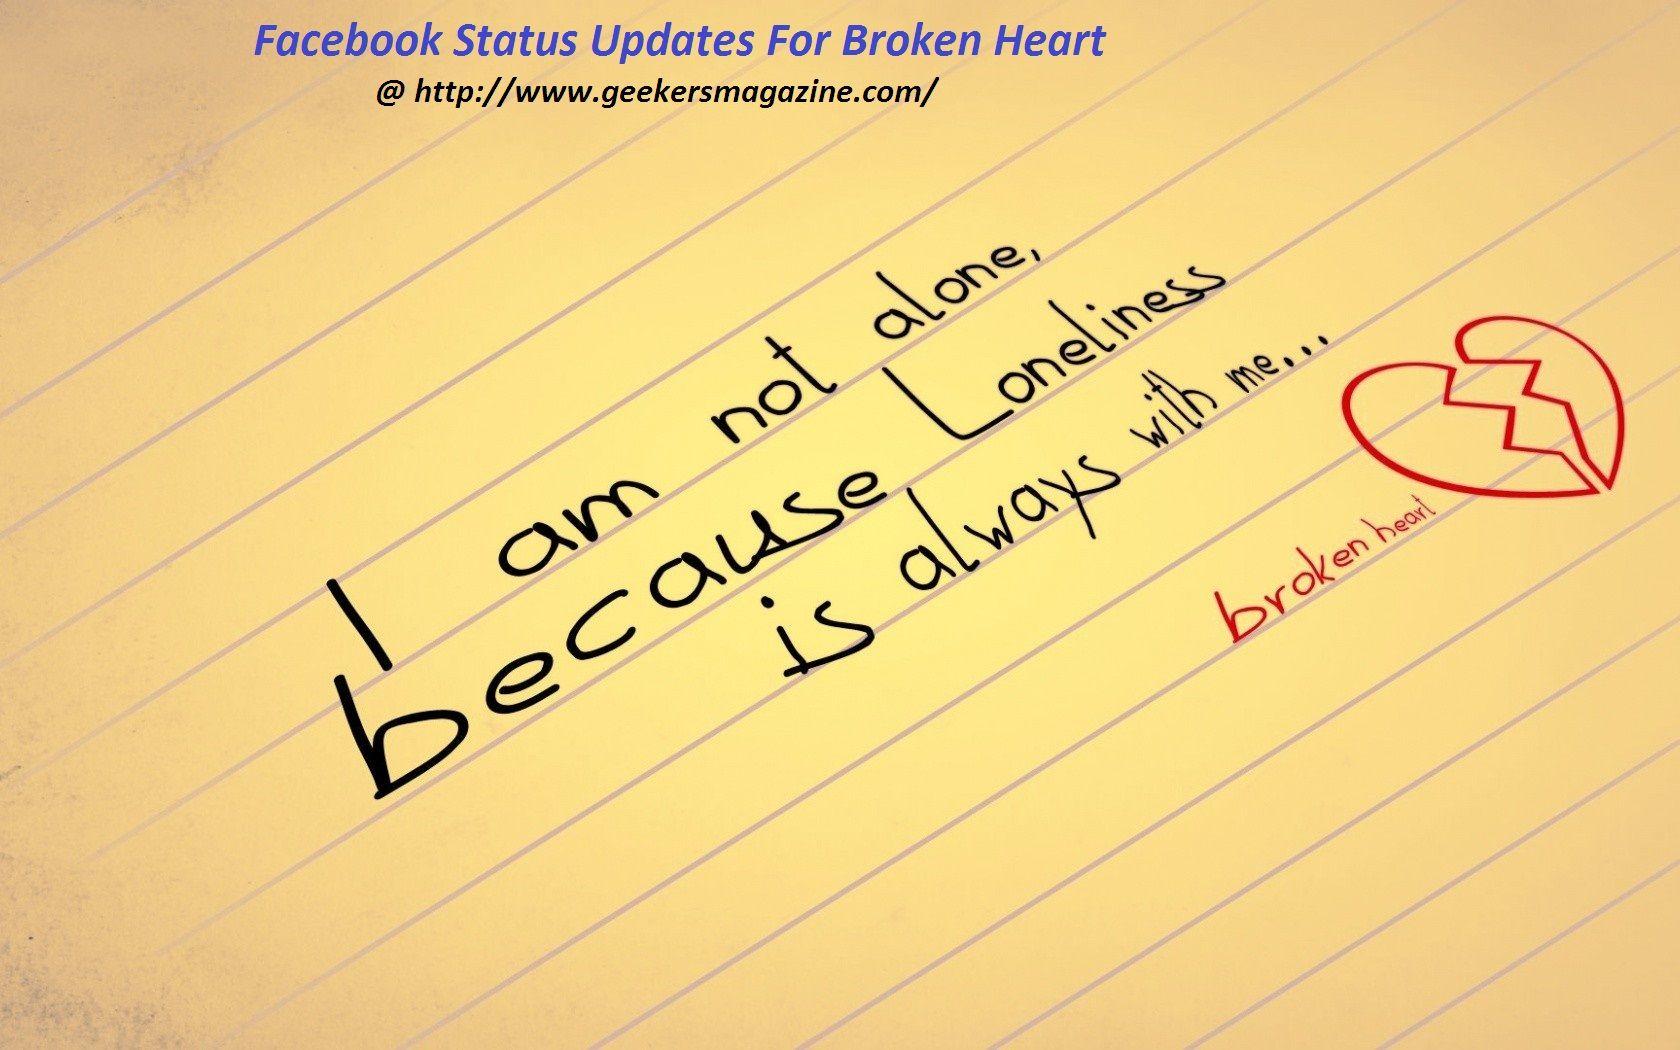 Status Updates Get More Status Updates kersmagazine · Love Hurts QuotesHurt